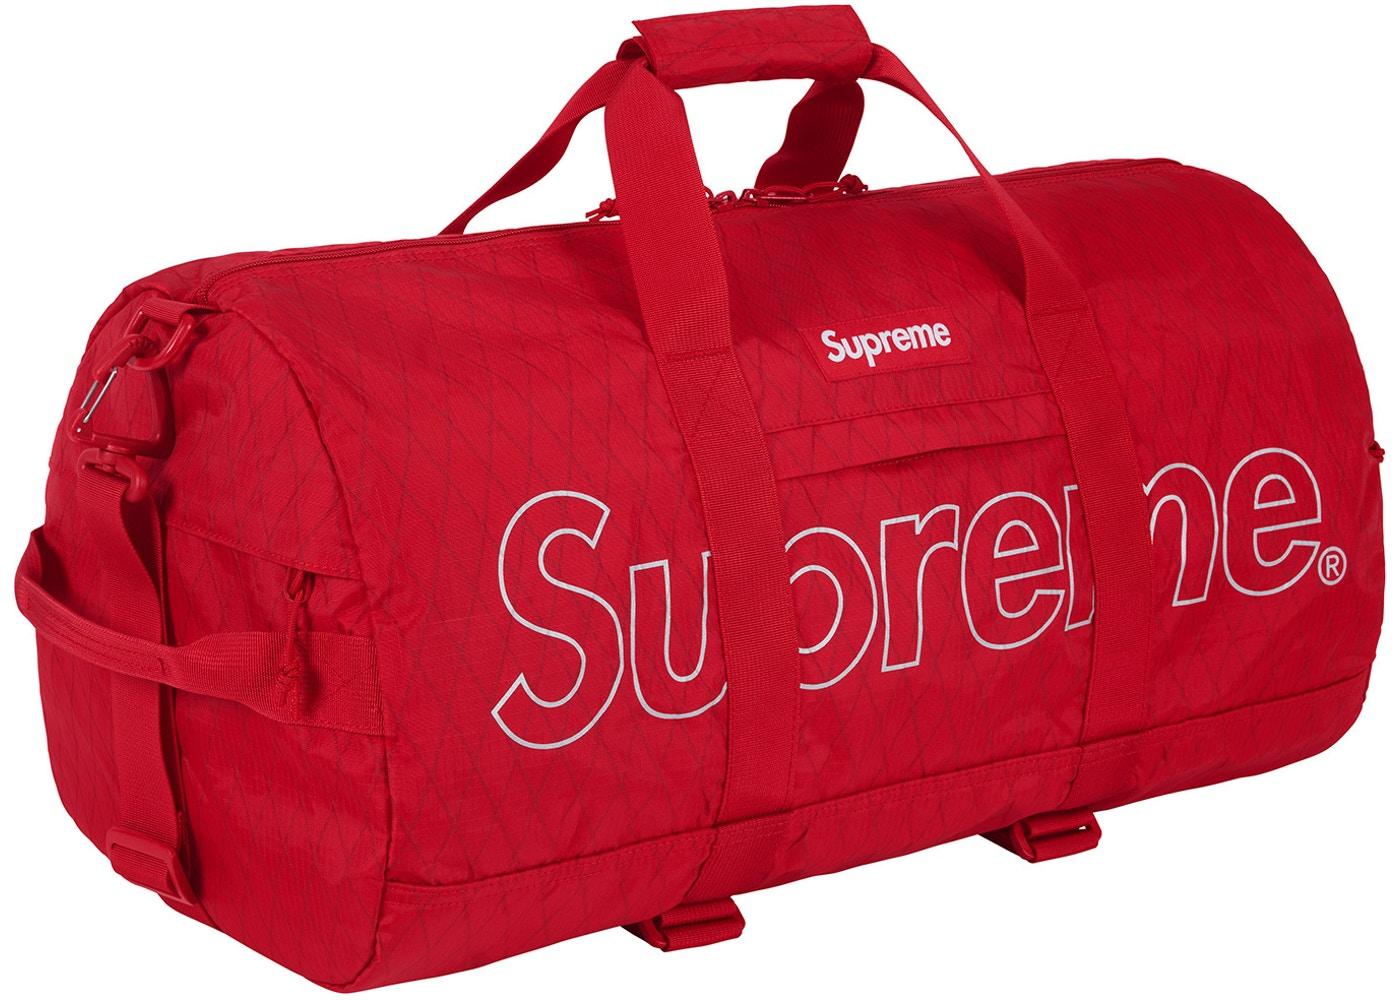 Supreme Duffle Bag (FW18) Red - FW18 380a315058e72